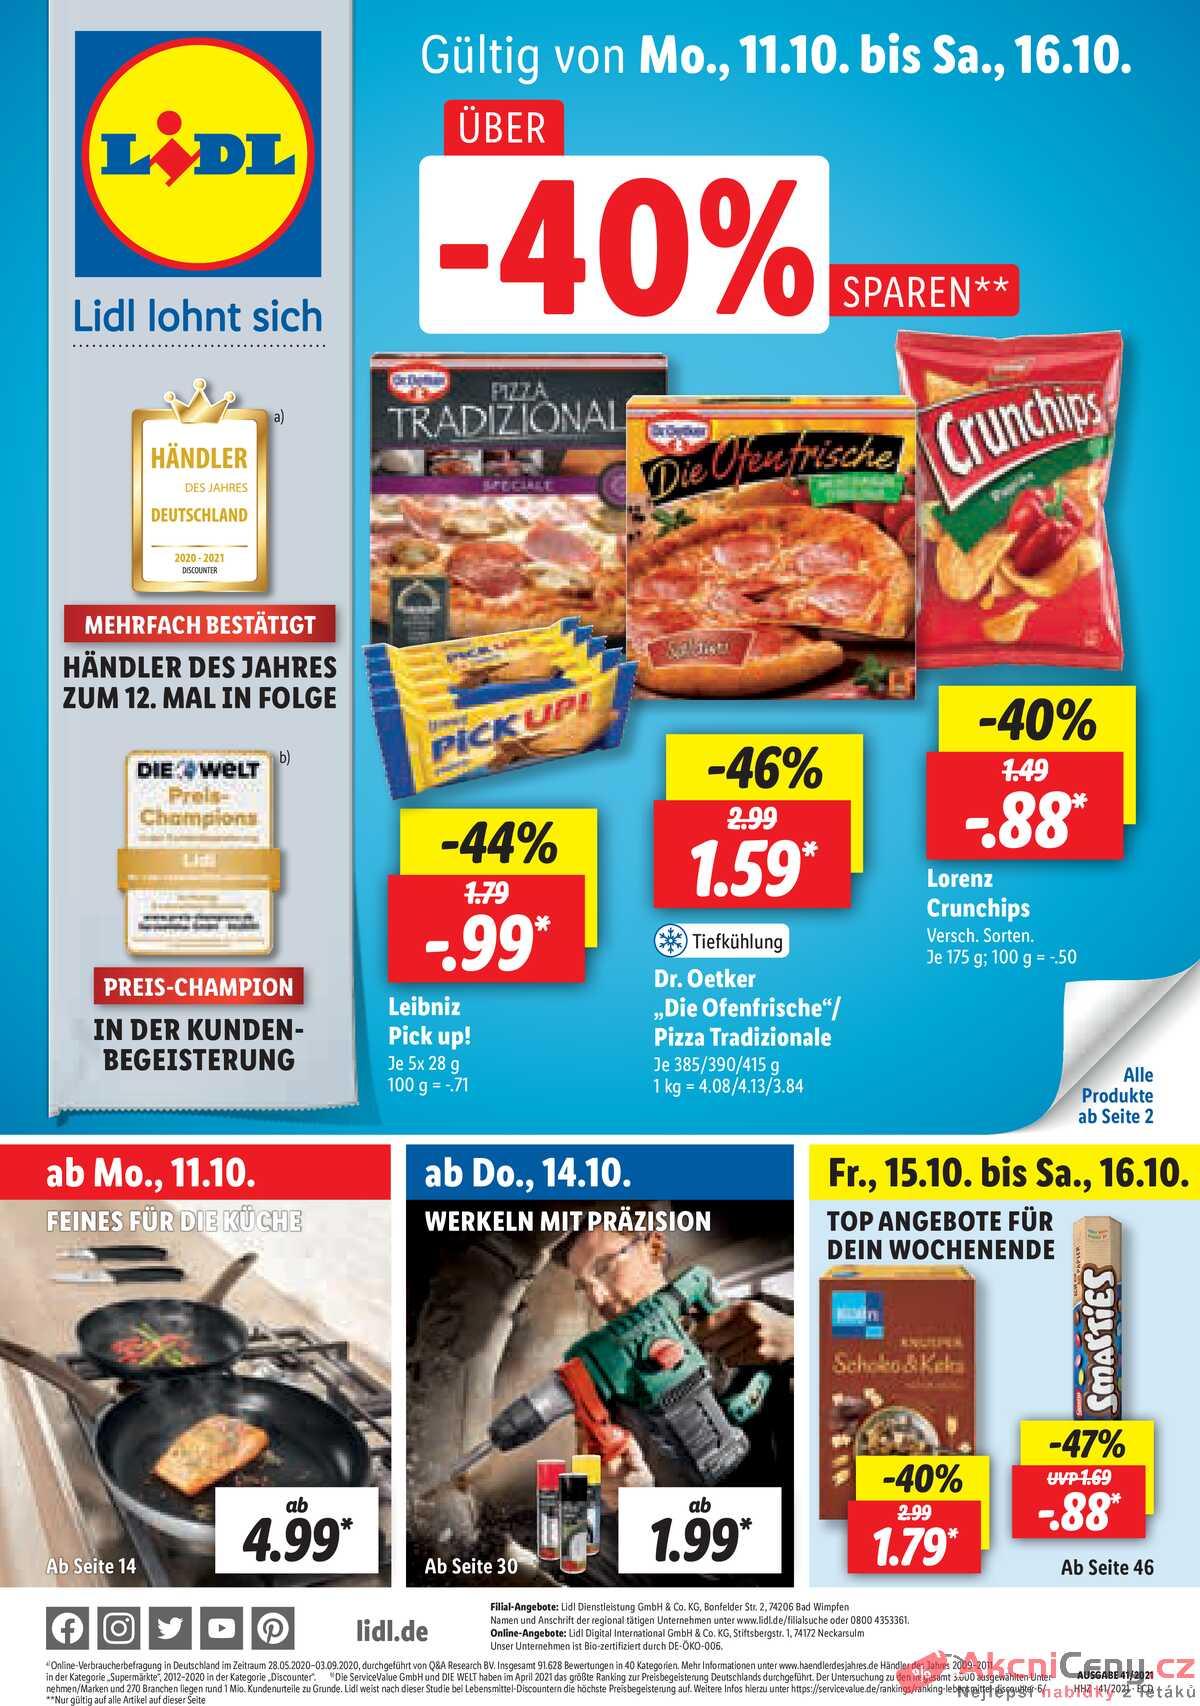 Leták Lidl Deutschland strana 1/26